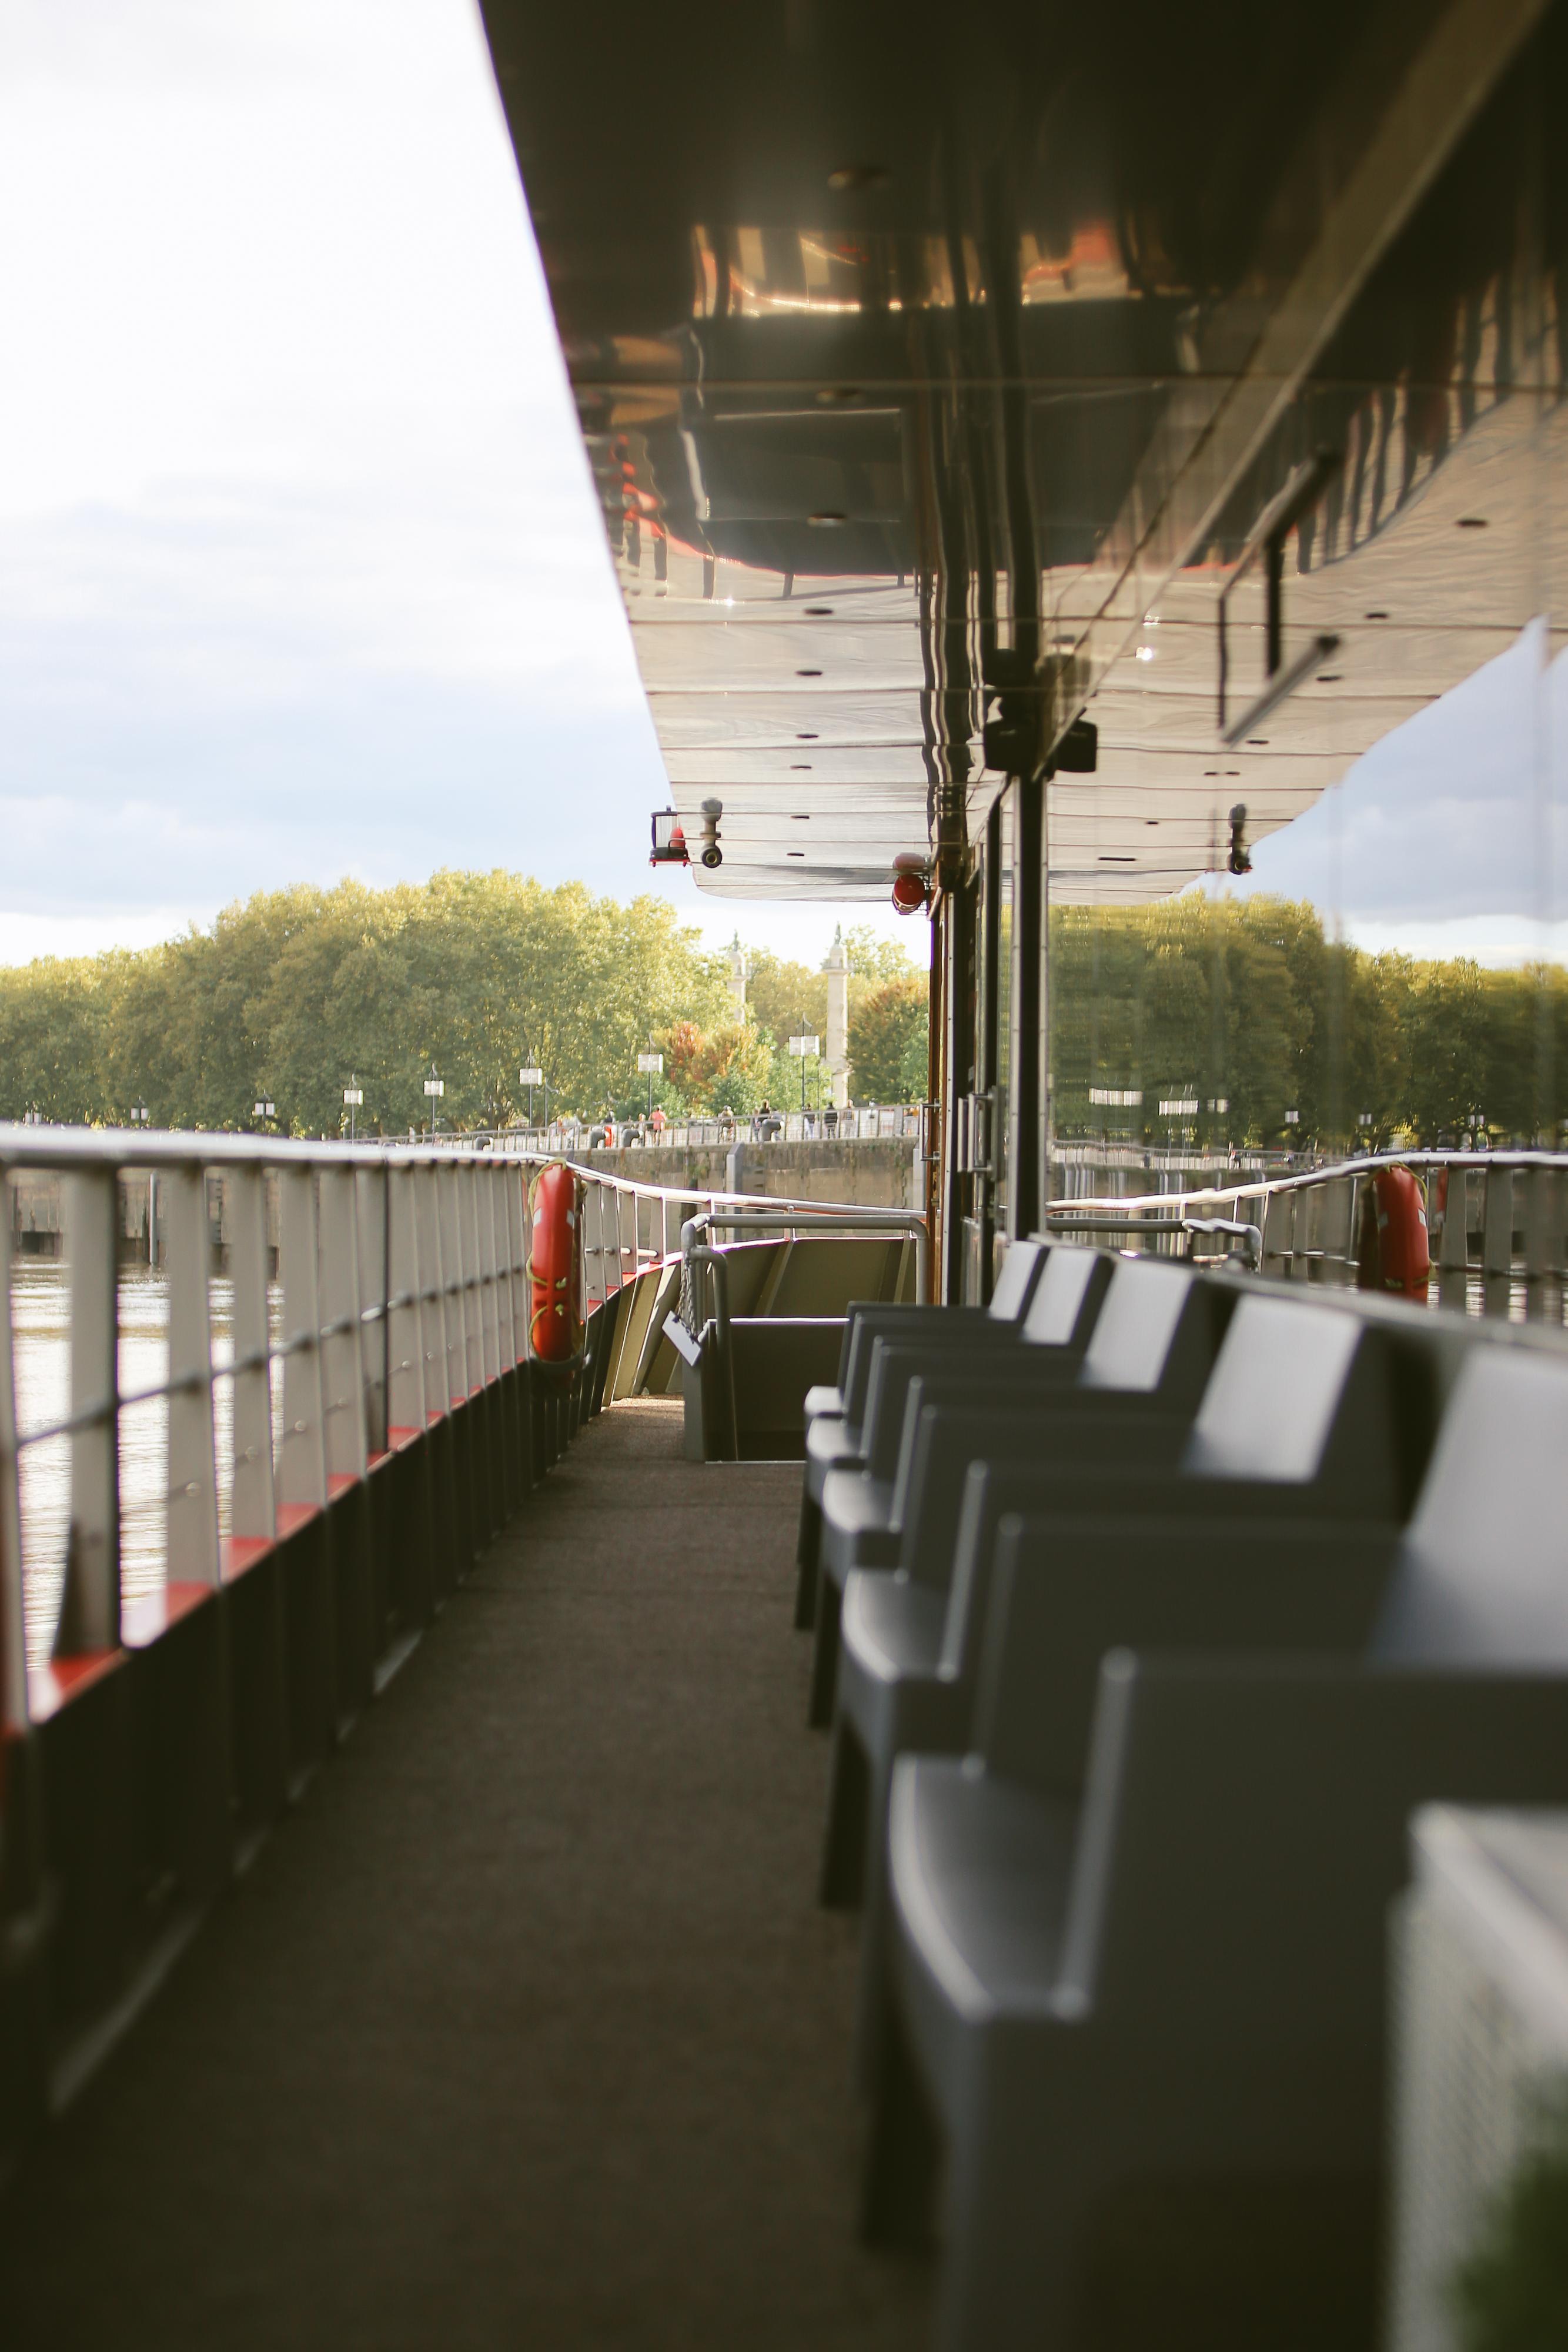 Afterwork_River_Cruise_sur_le_Sicambre_Photographe_d_evenements corporate_christophe_boury_www.photographe-33.fr_HD_IMG_1807